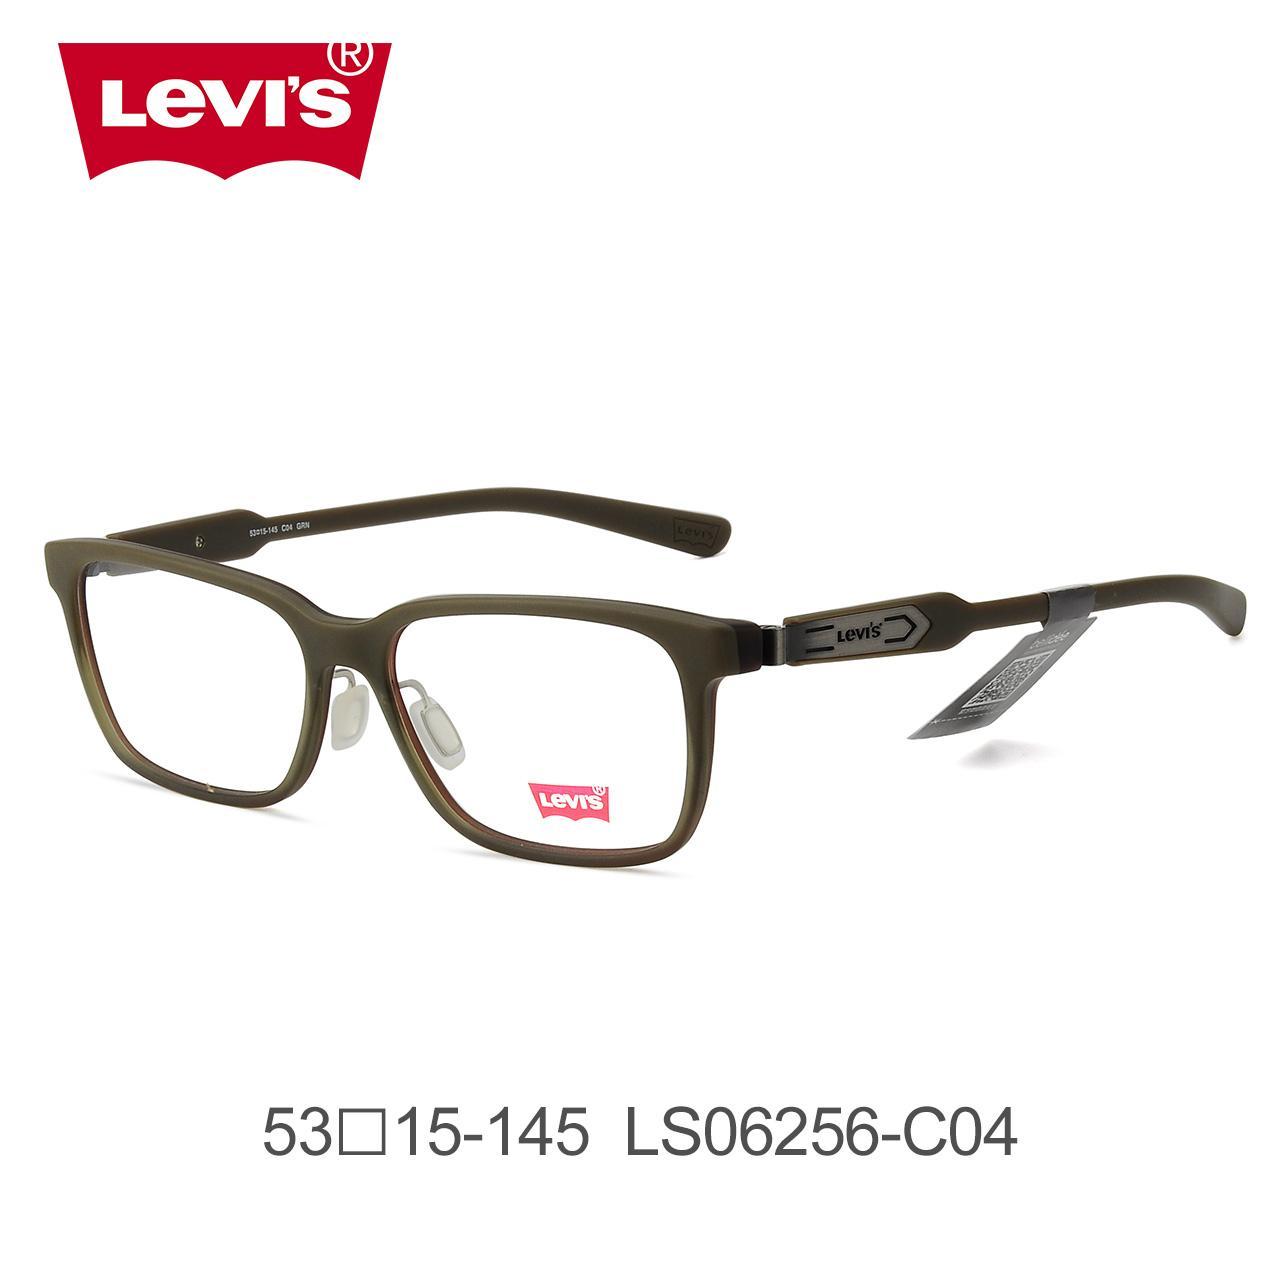 Levis Bingkai Kacamata Kasual Bingkai Kacamata Pria atau Wanita Optik